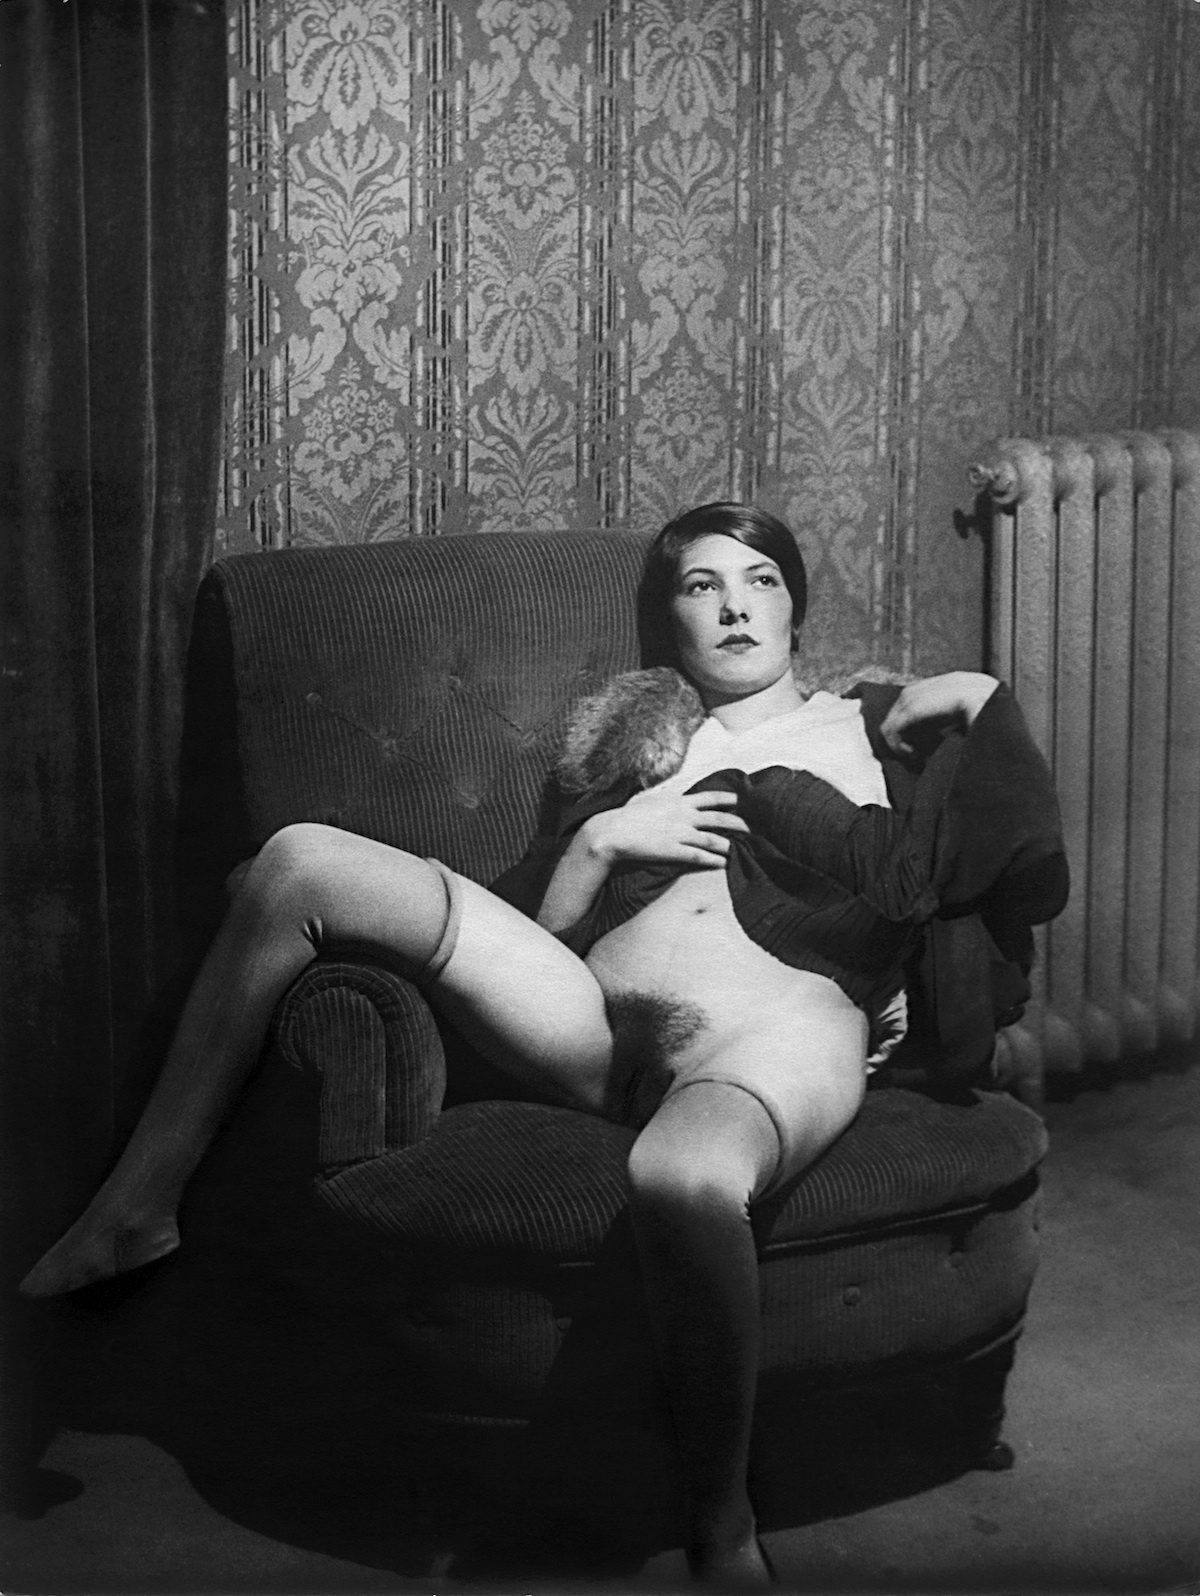 podemos prostitución prostitutas francesas